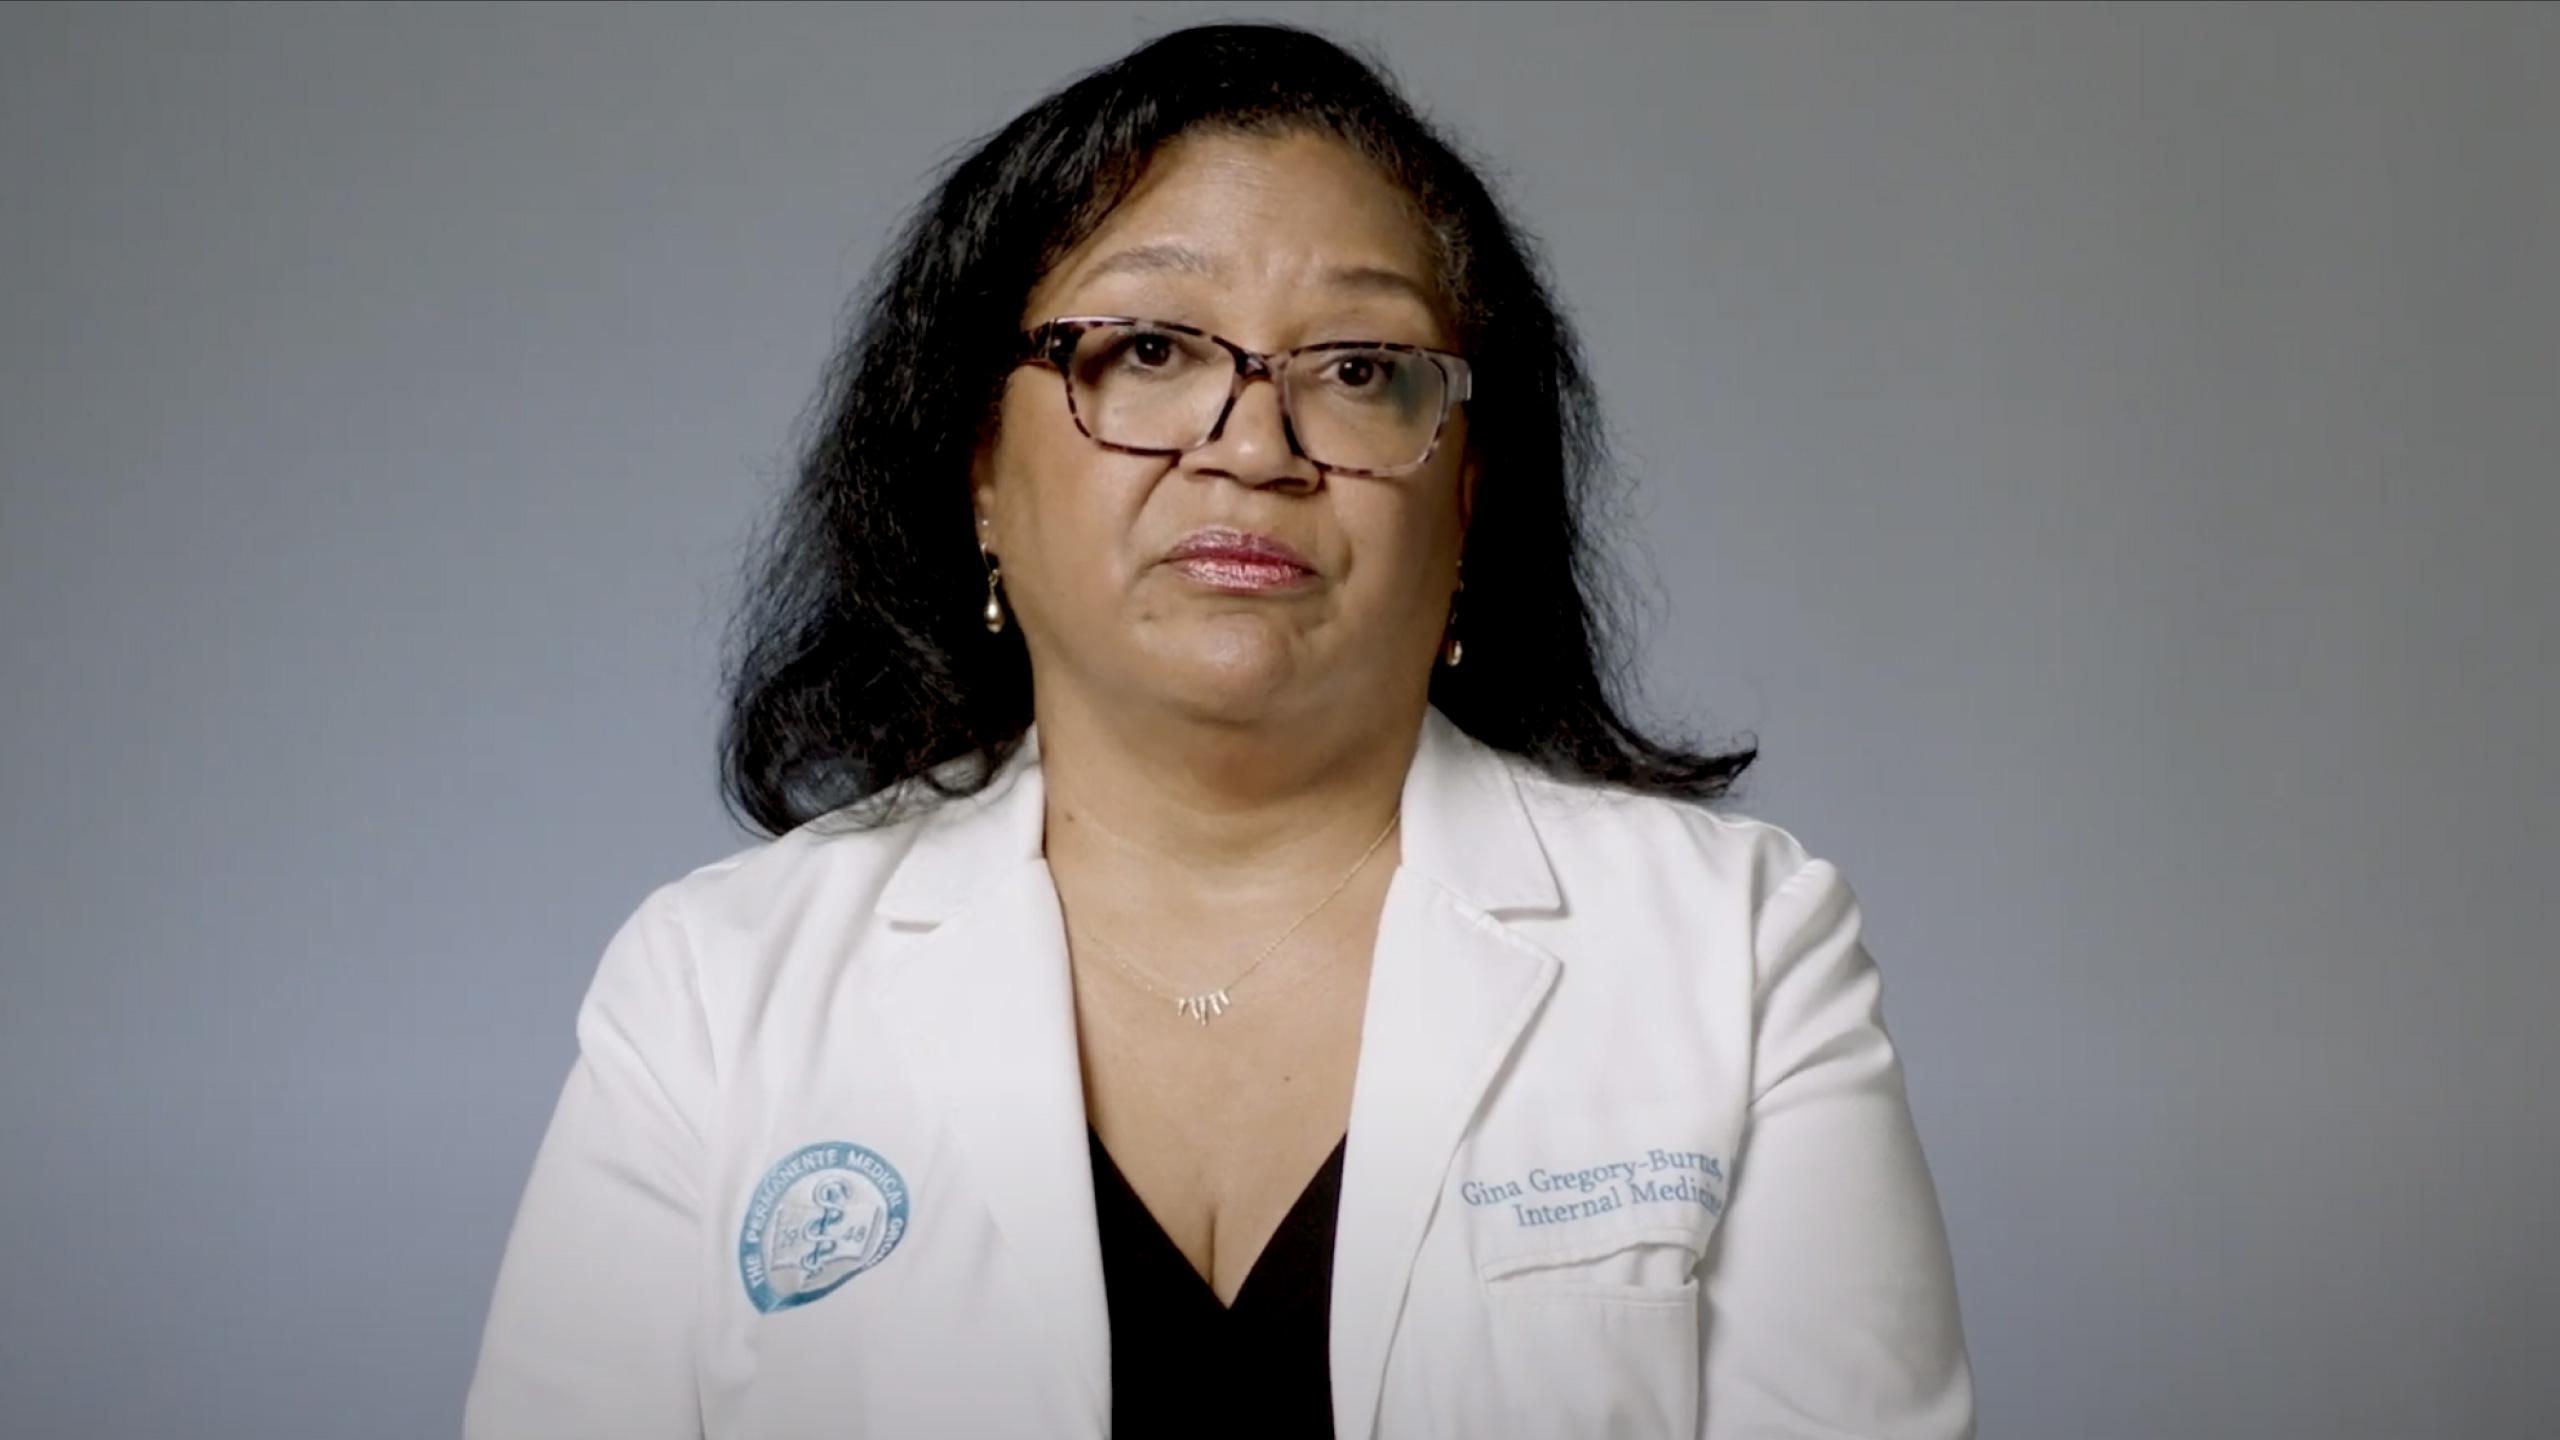 Don't I have immunity if I had COVID? Gina Gregory-Burns, MD